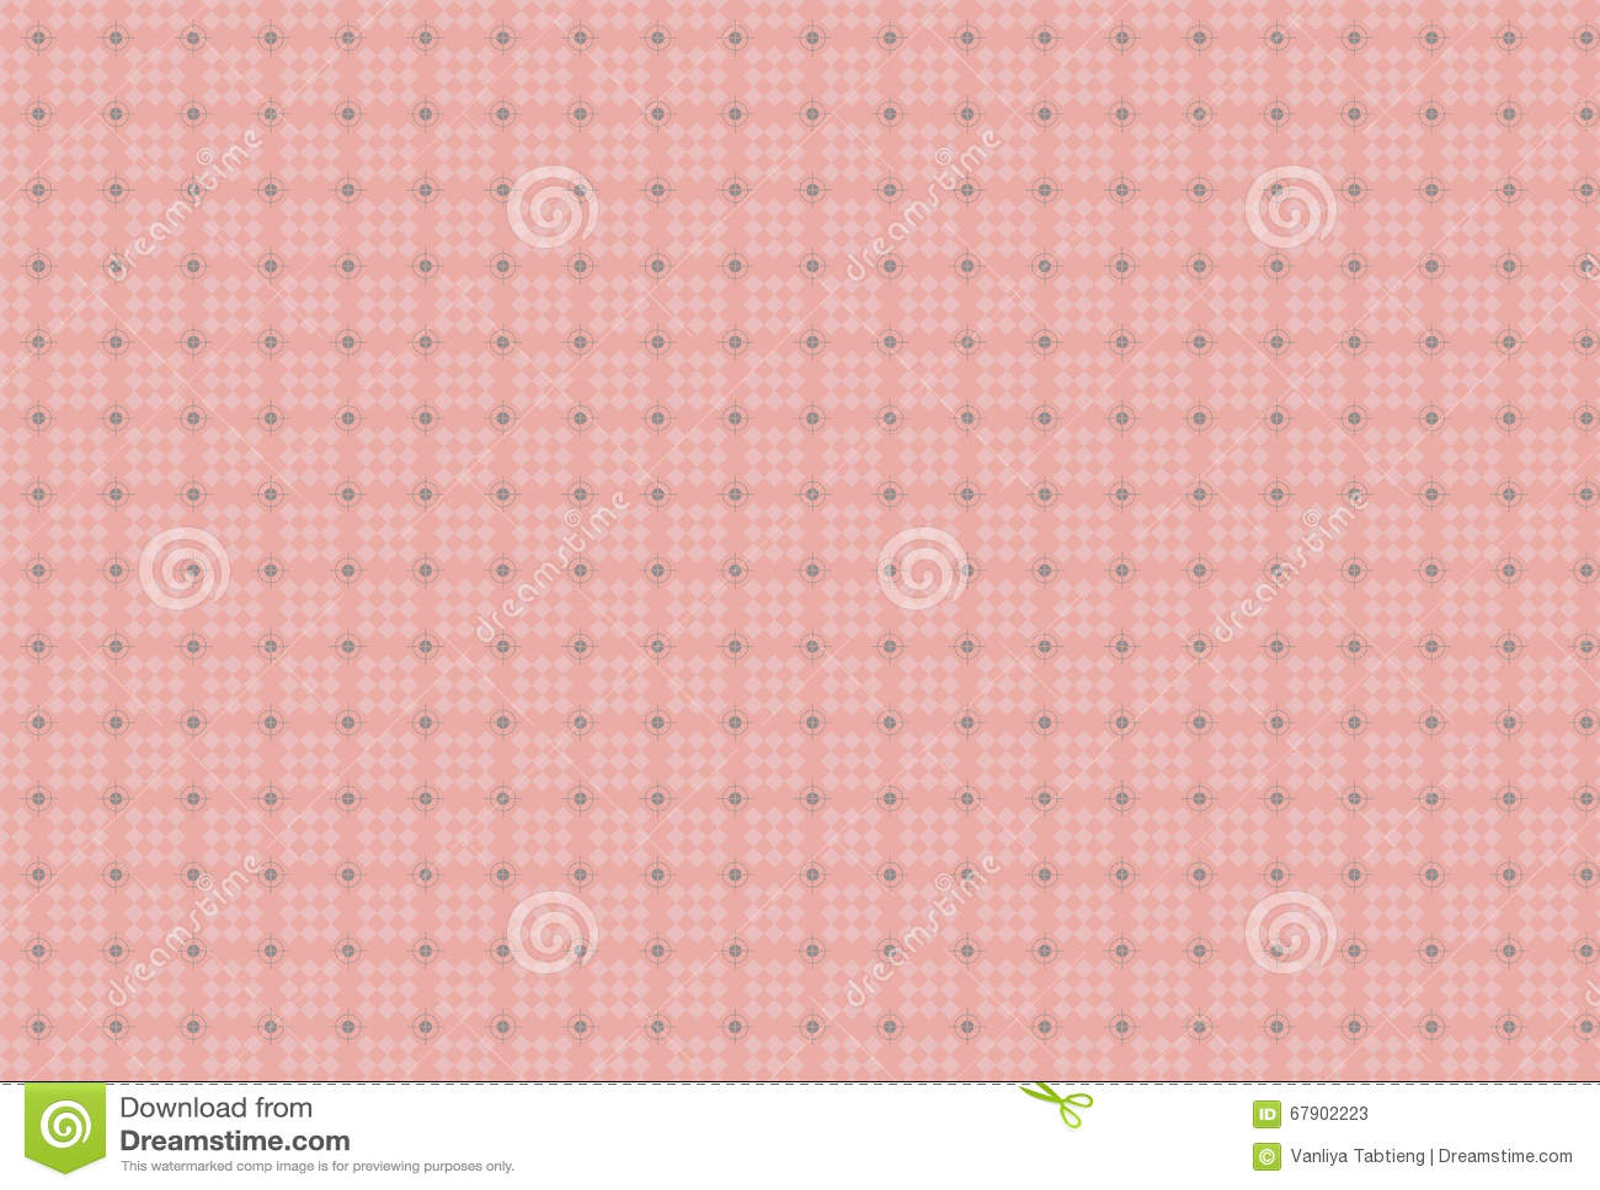 seamless geometric square and circle pattern